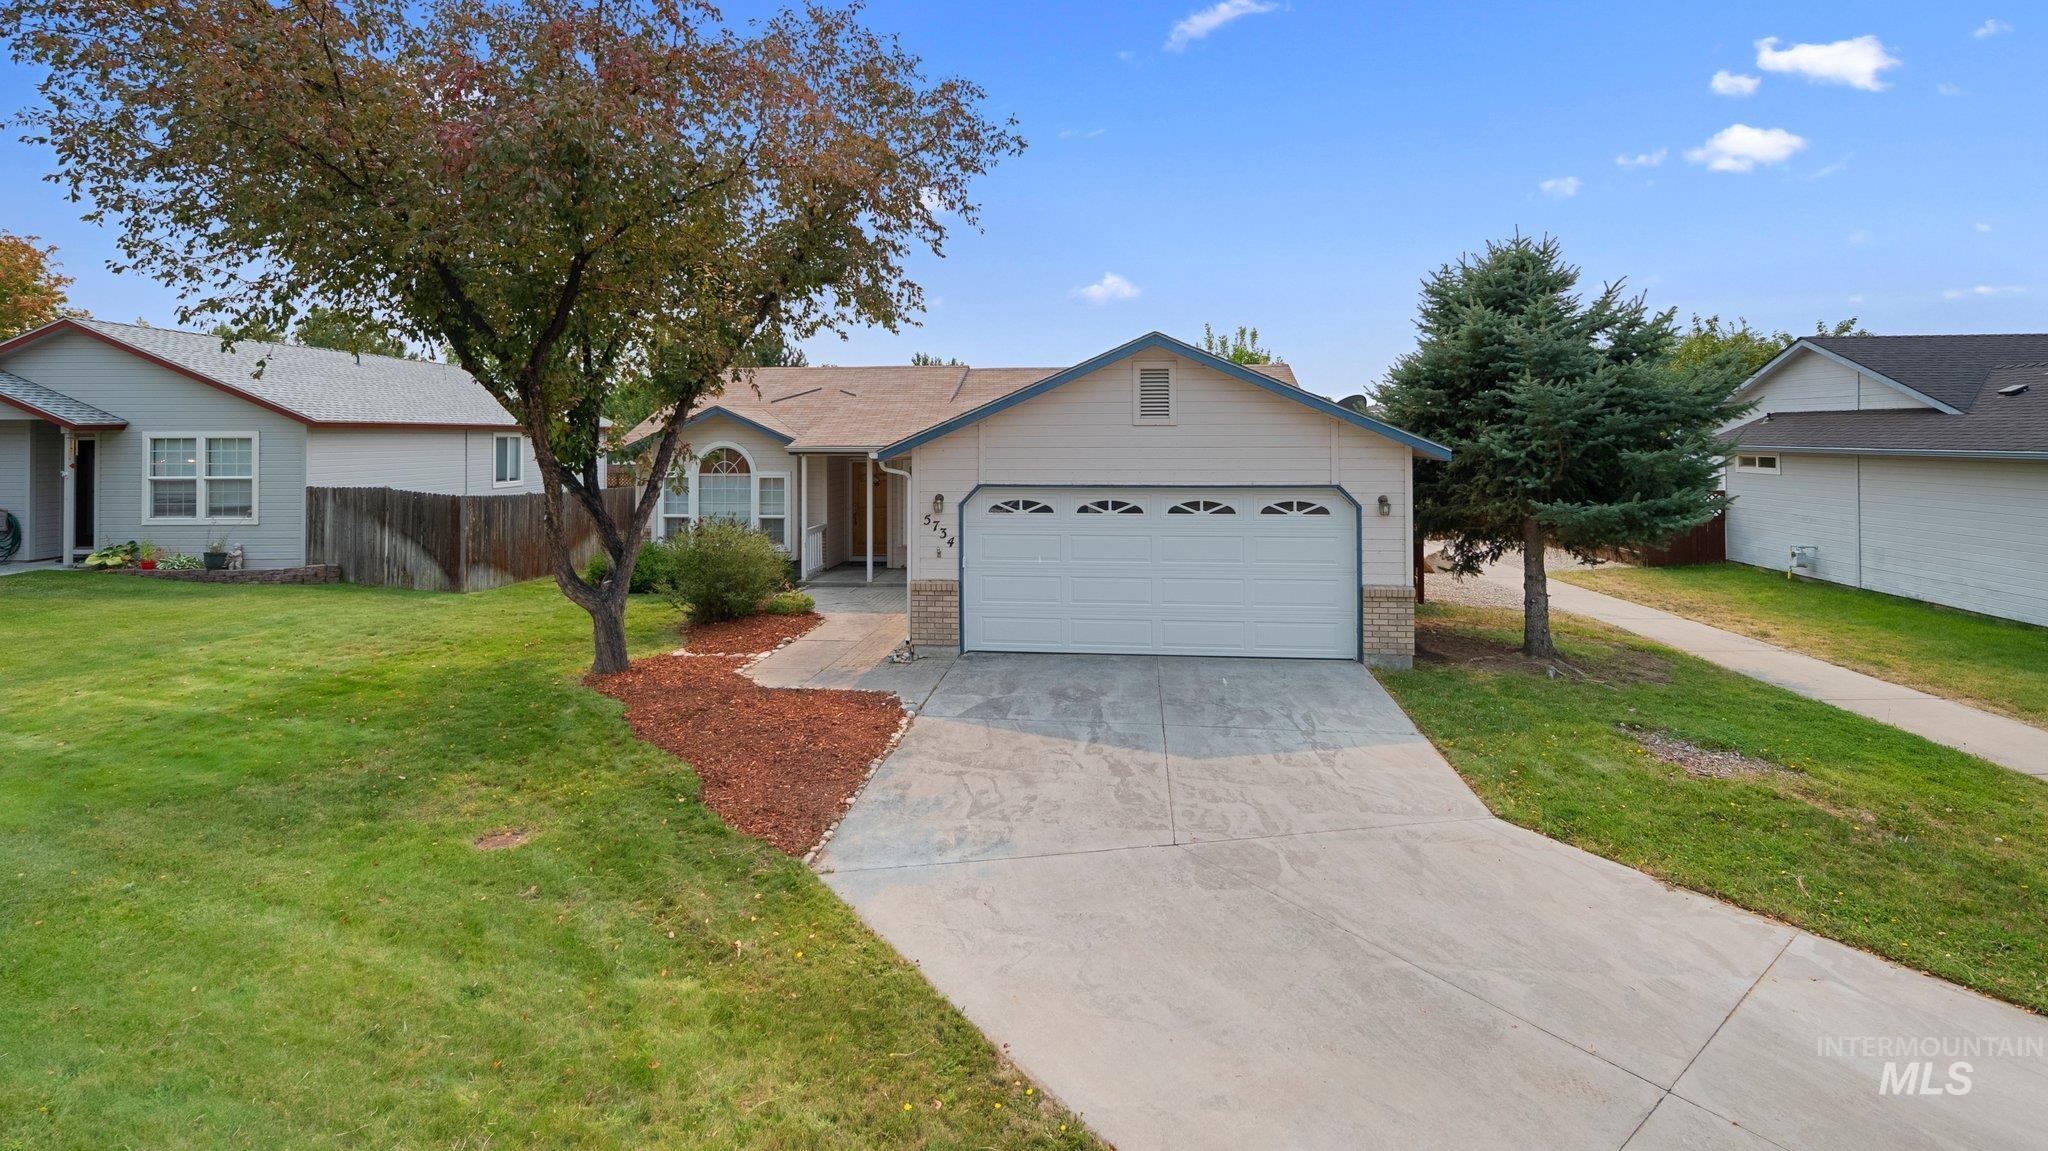 5734 S Flax Pl Property Photo